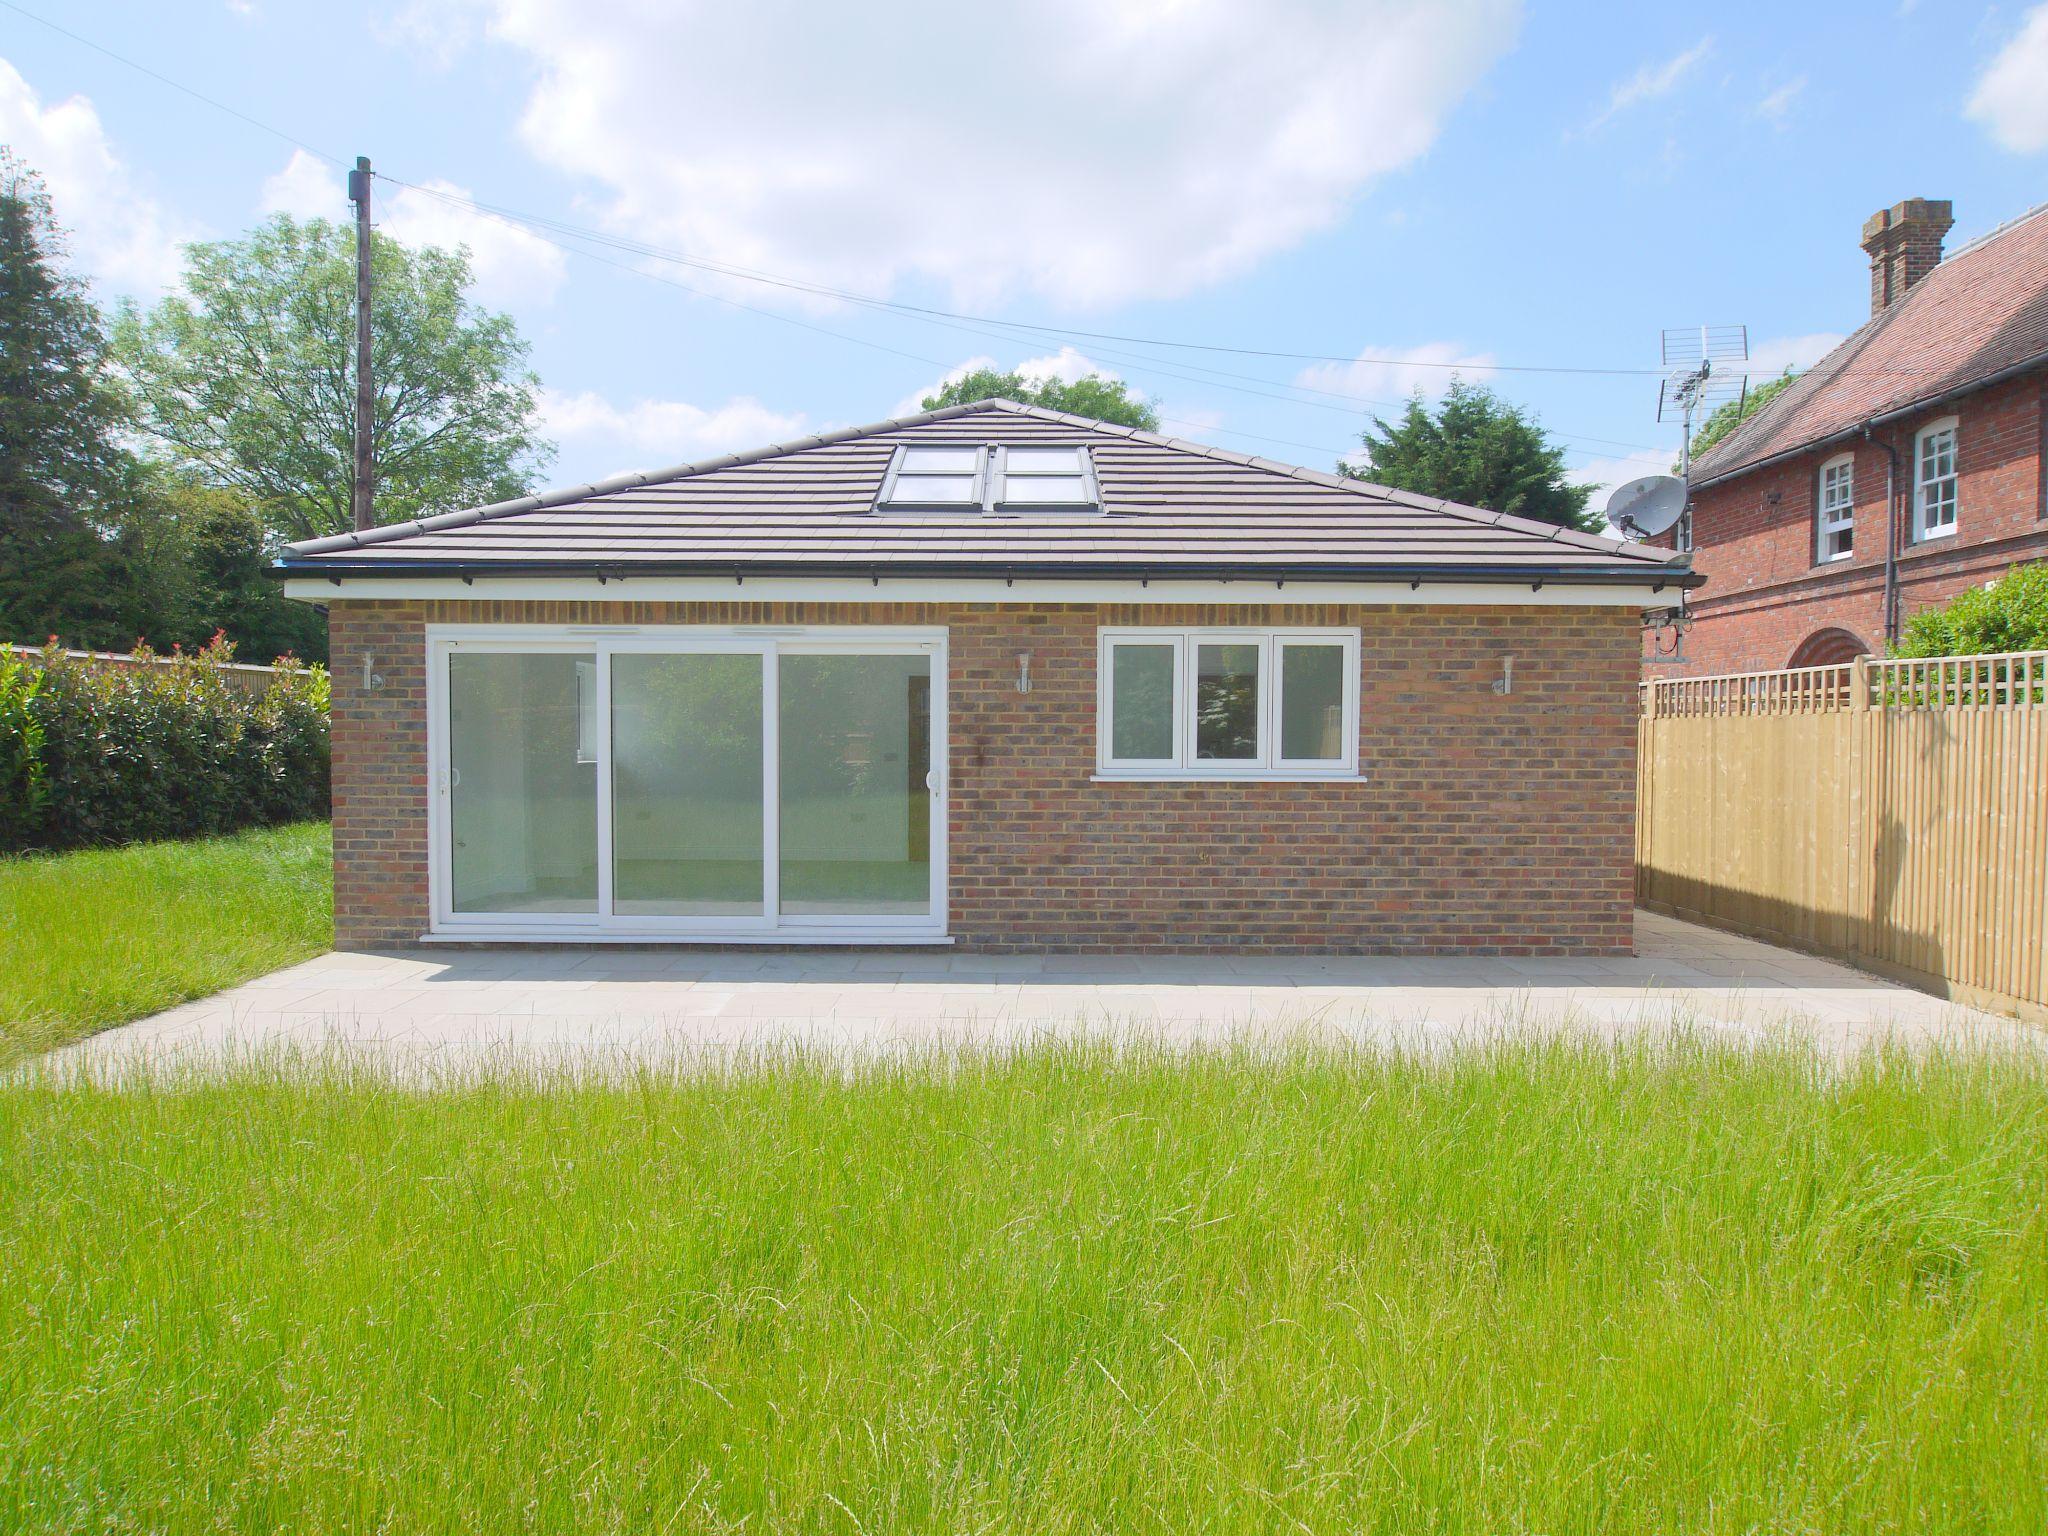 3 bedroom detached bungalow For Sale in Sevenoaks - Photograph 2